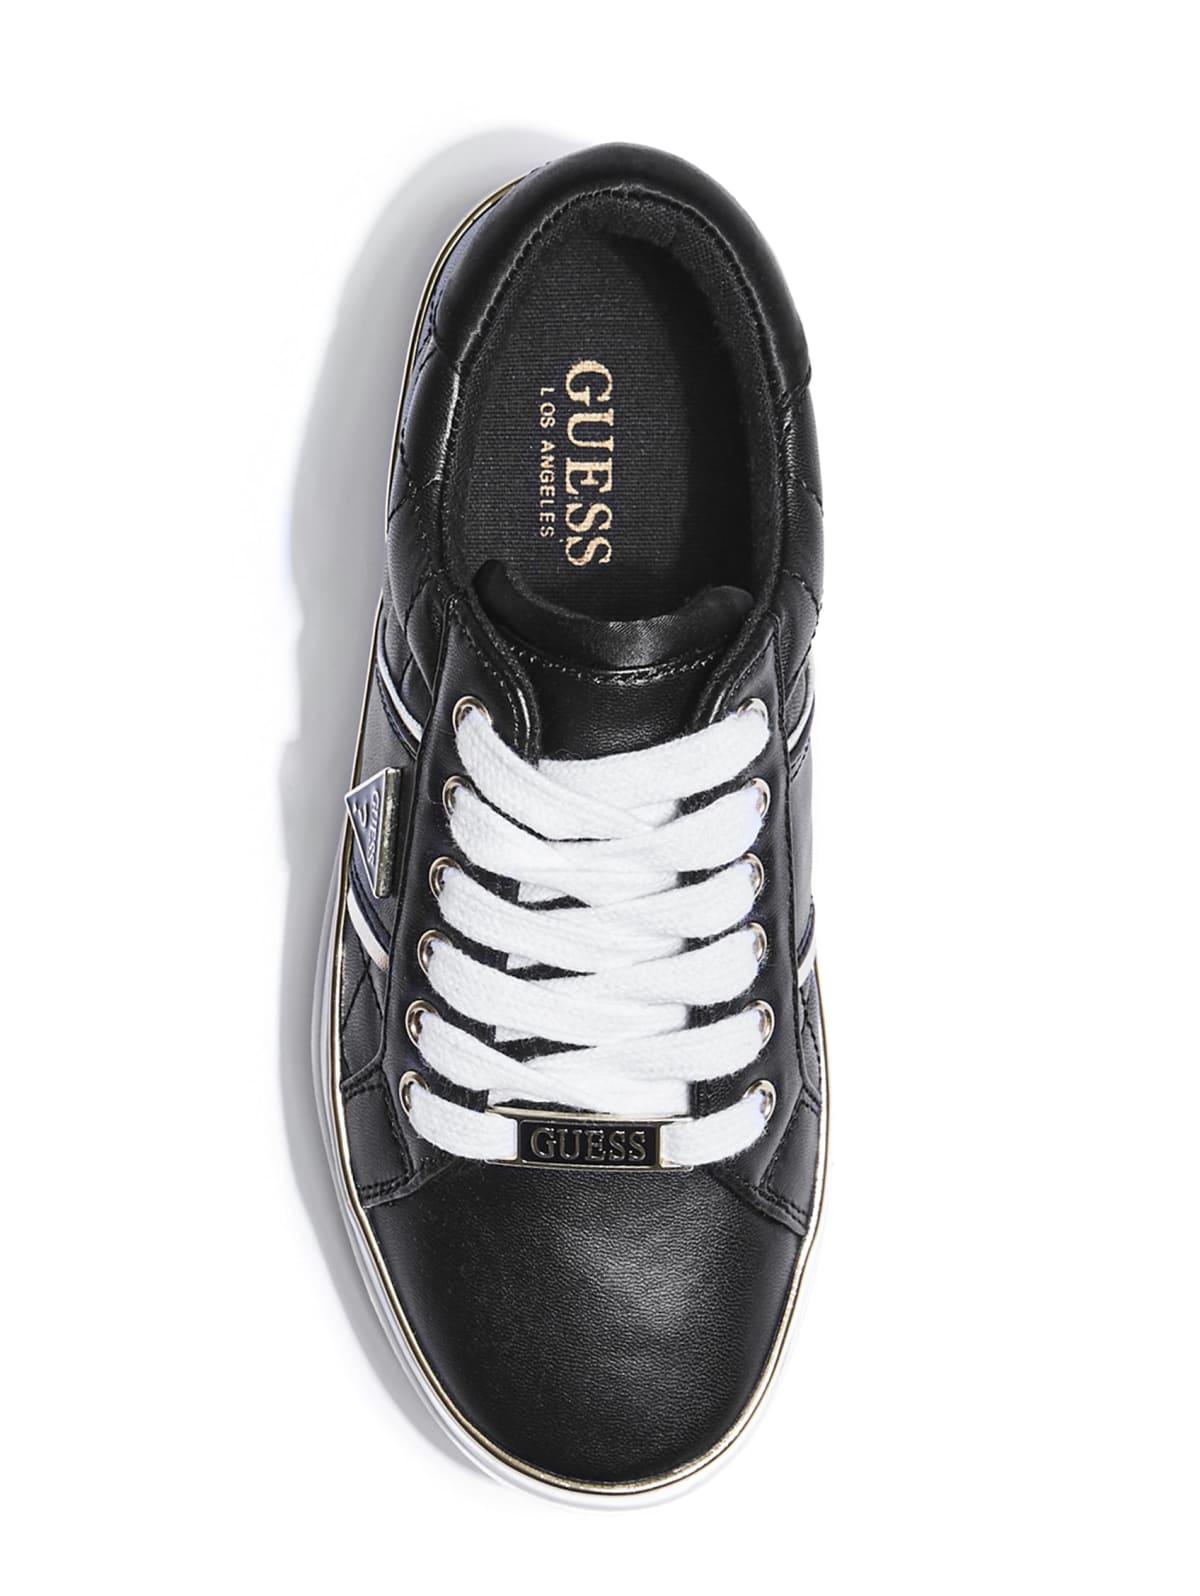 GUESS Factory Kids Gayla Girls Platform Sneakers